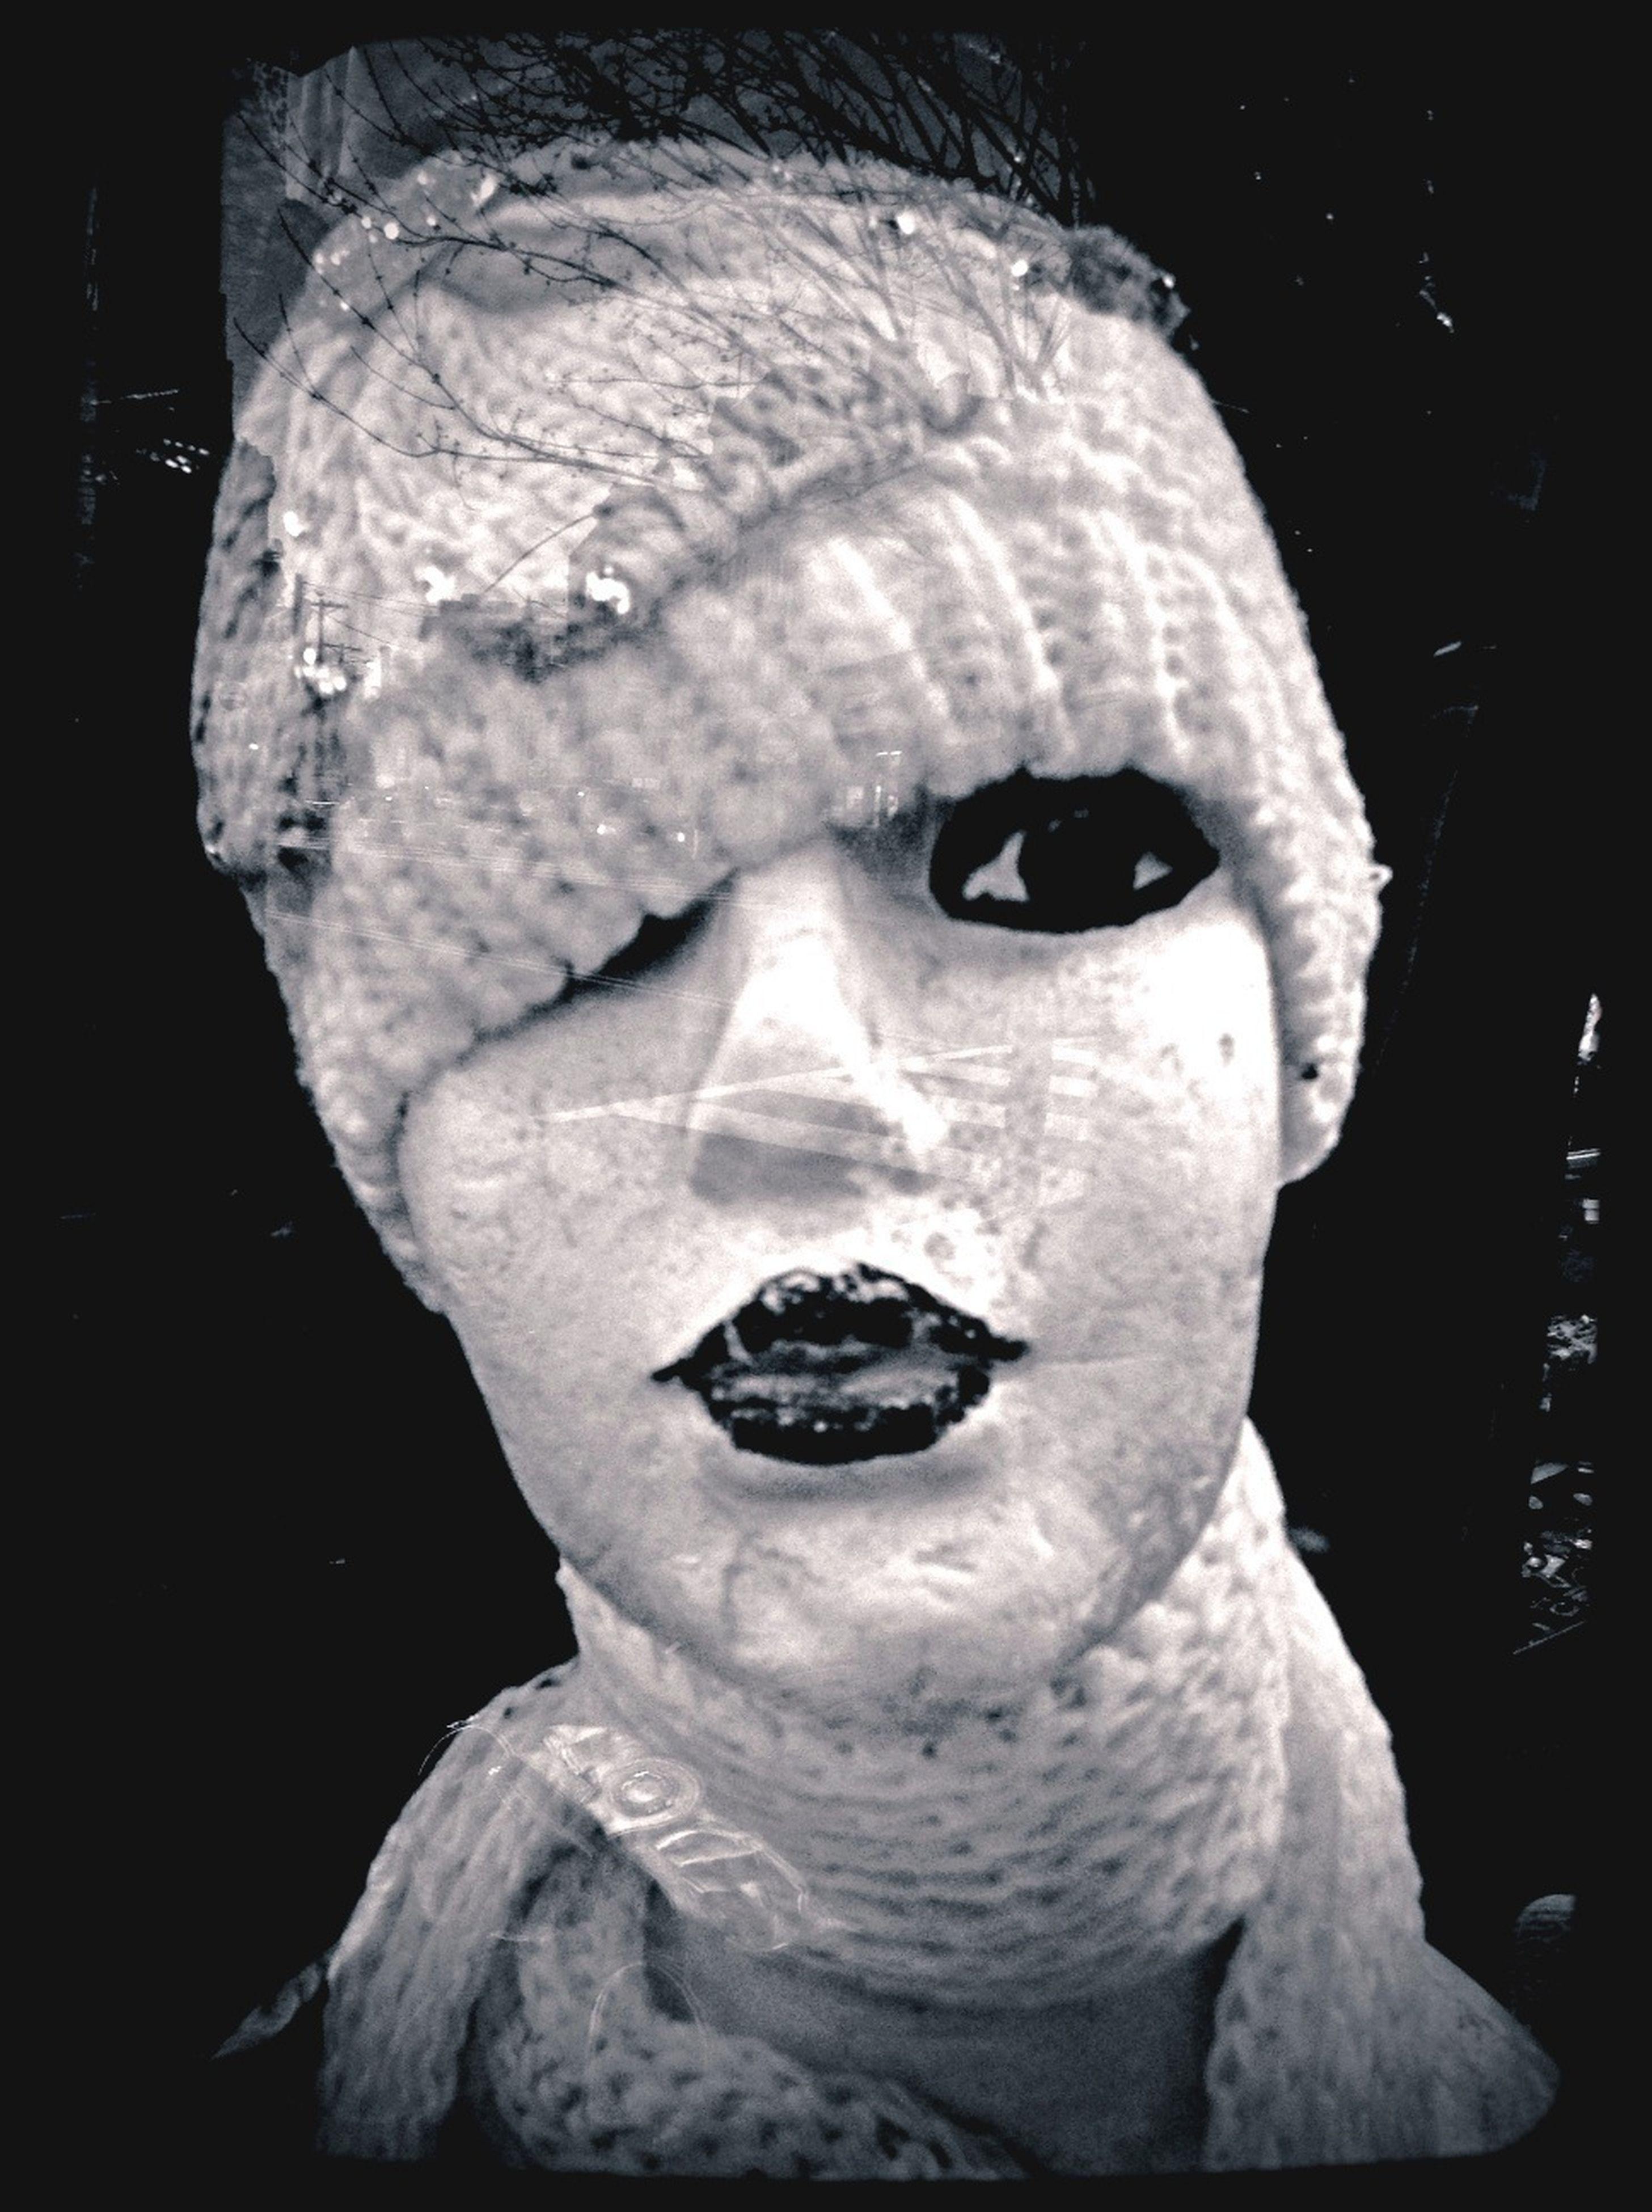 close-up, cold temperature, winter, snow, human representation, indoors, night, art and craft, creativity, sculpture, holding, black background, art, frozen, front view, reflection, studio shot, men